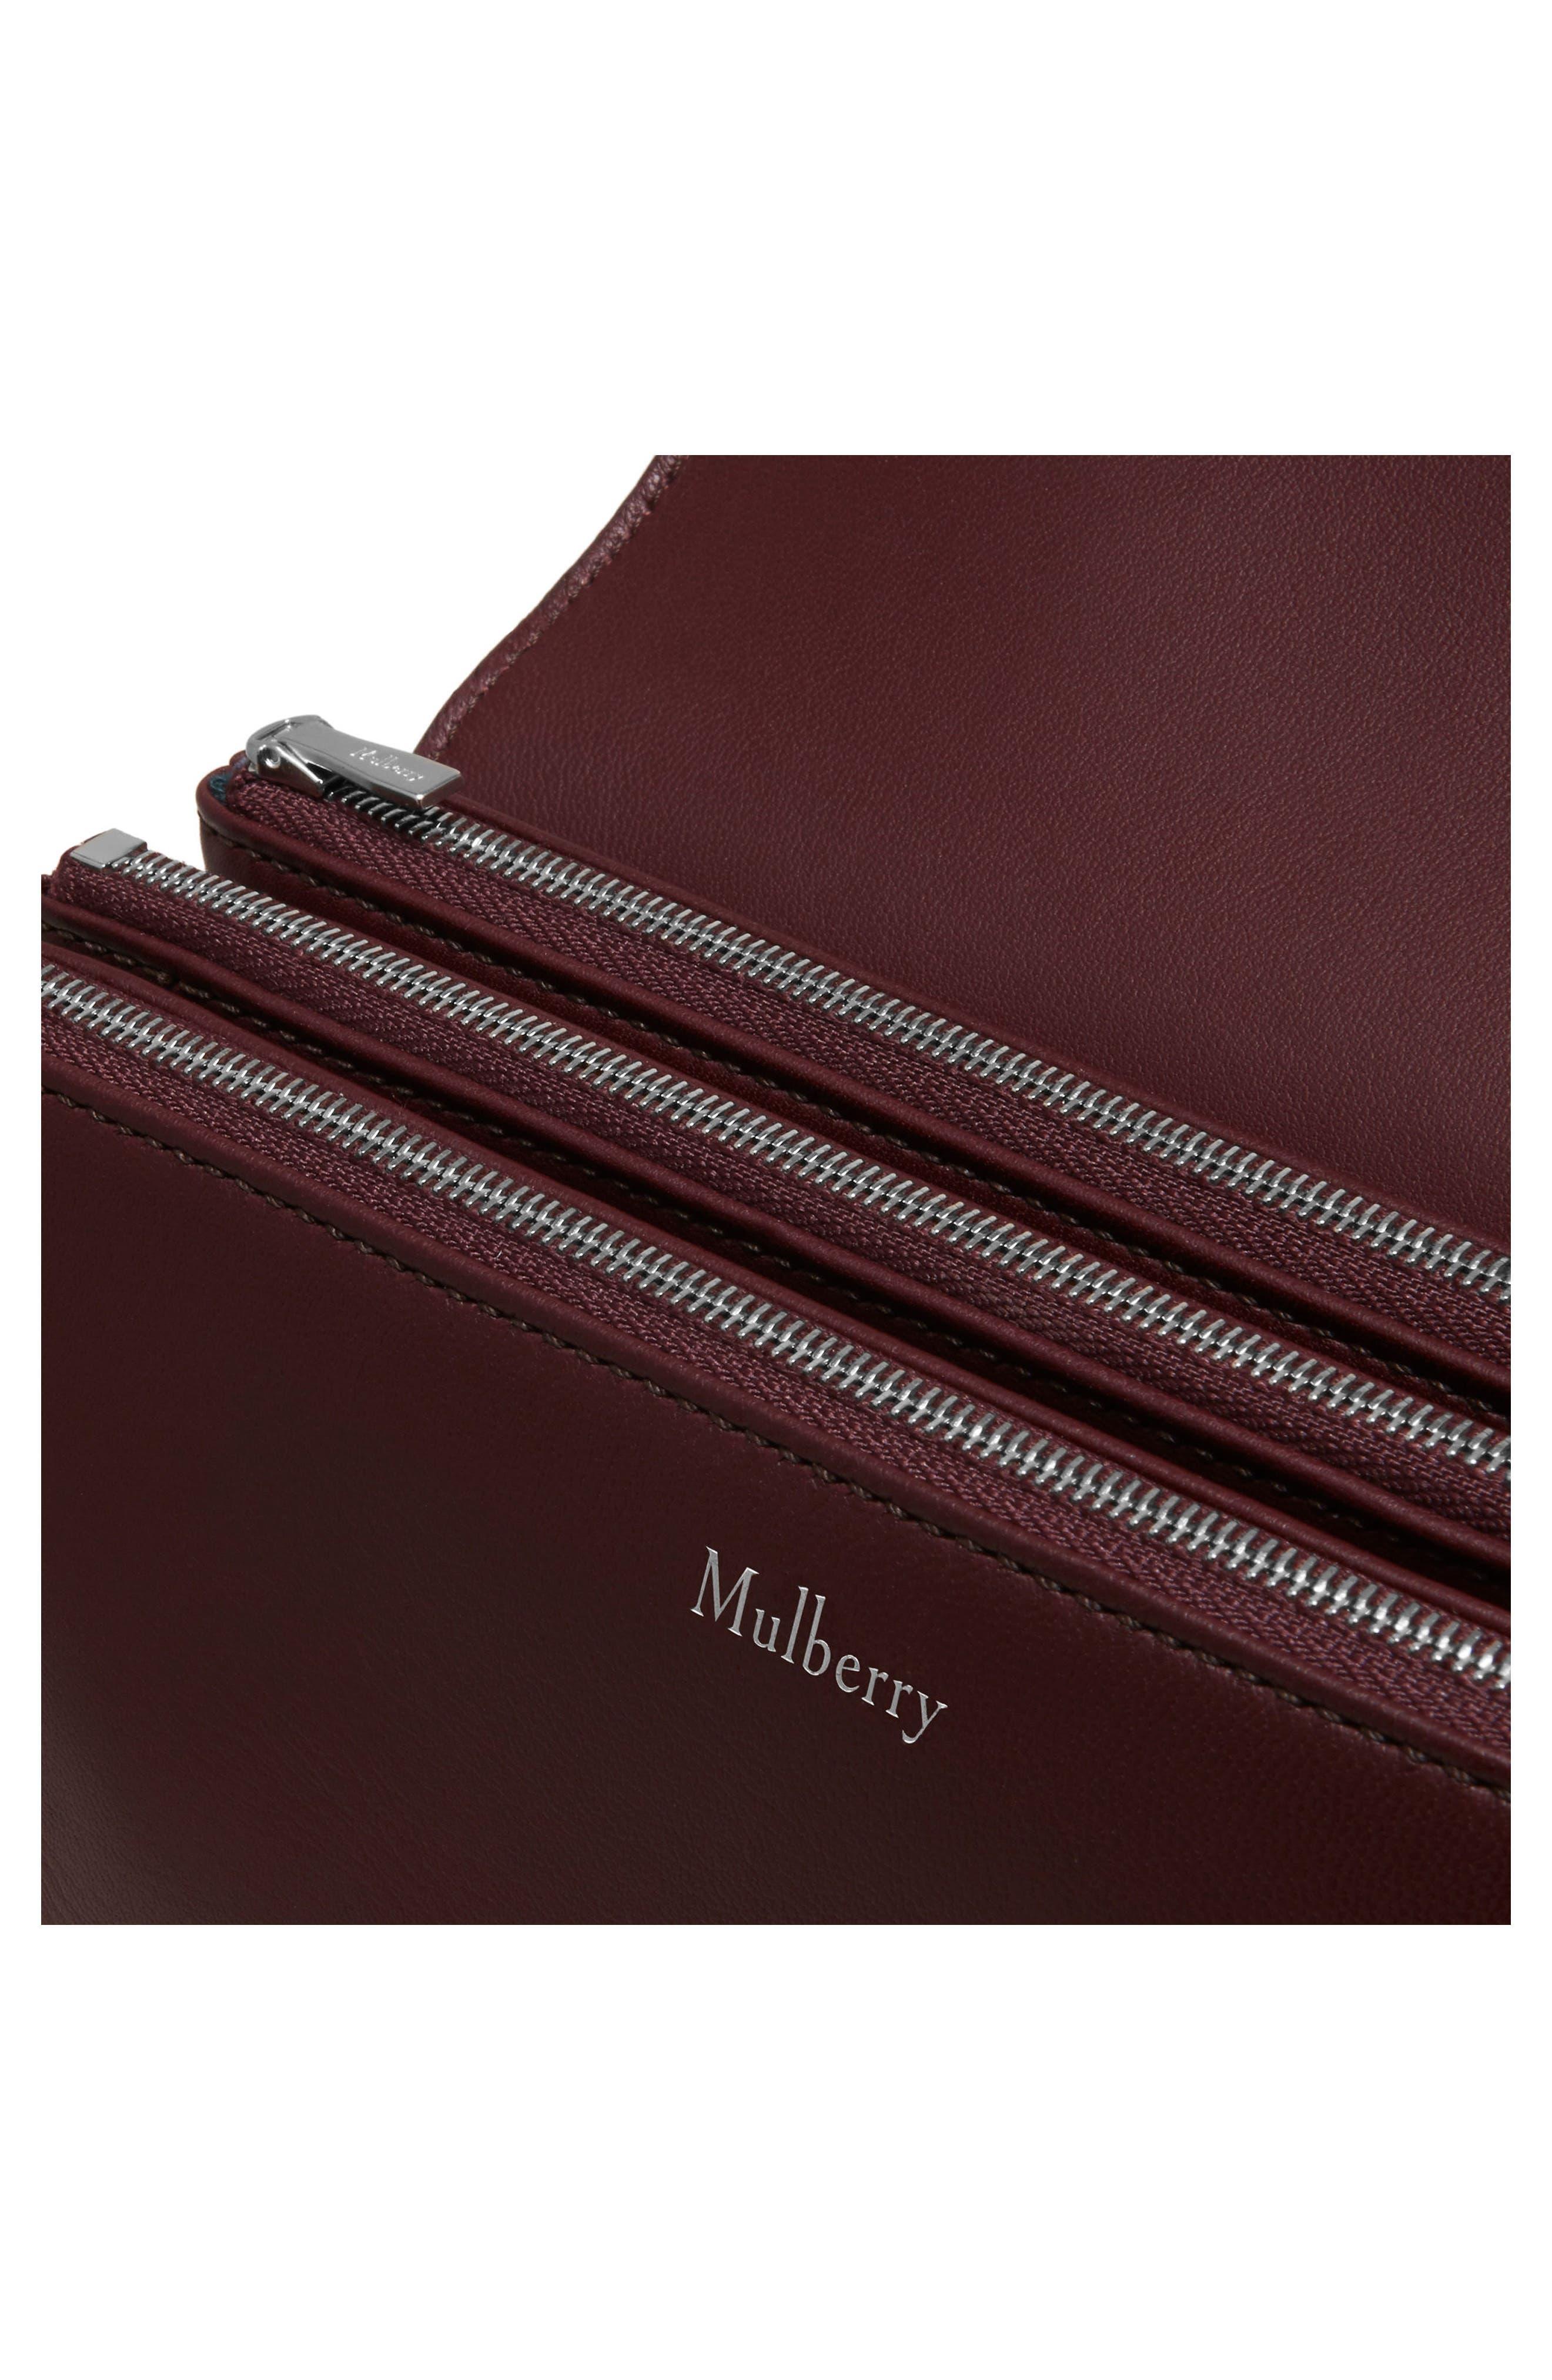 Clifton Leather Bag,                             Alternate thumbnail 4, color,                             930